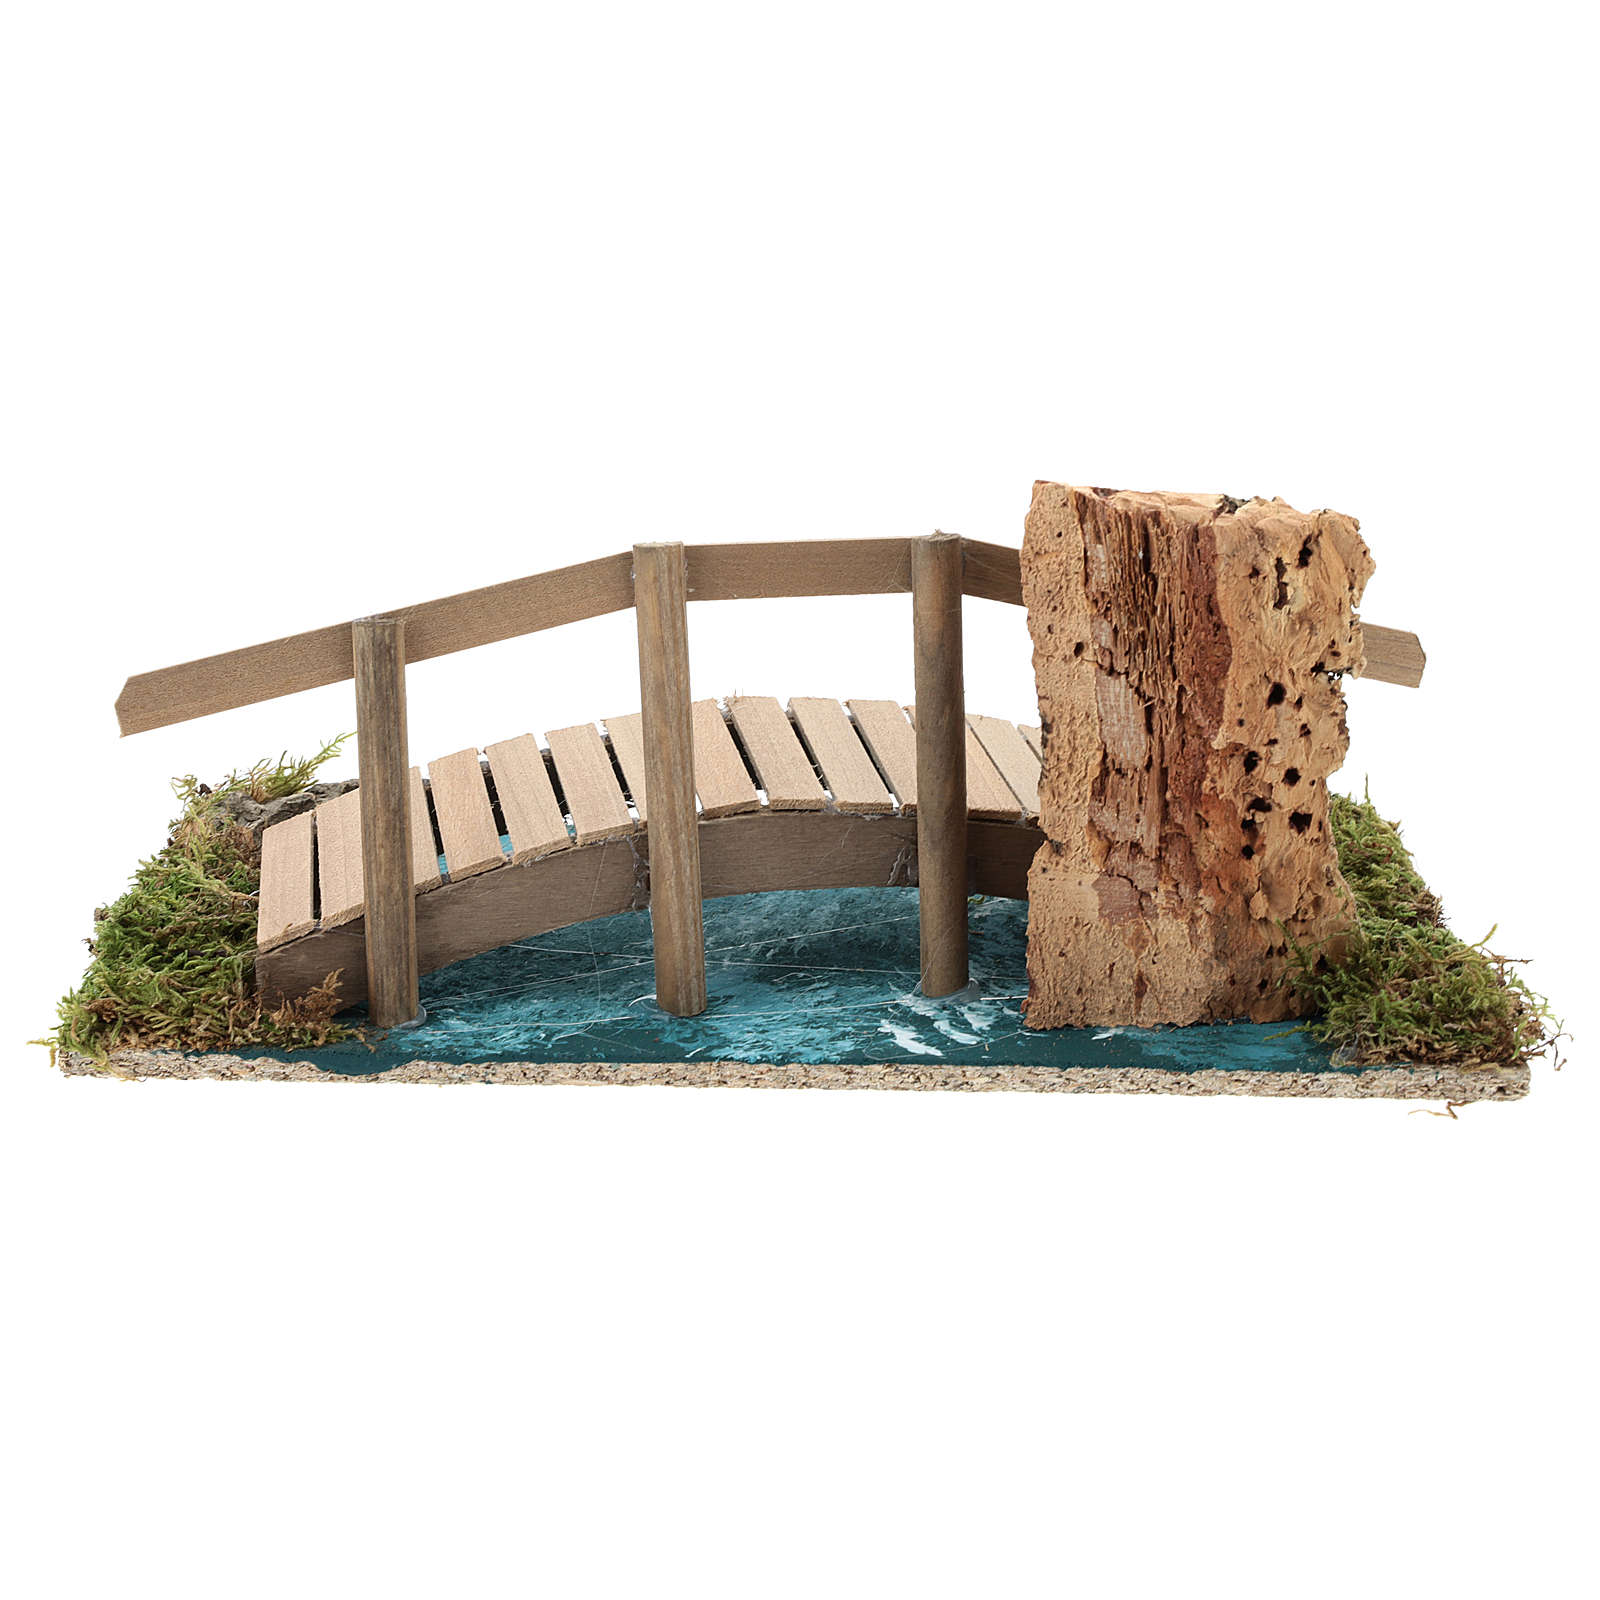 Bridge with railing 11x26x12 cm for Nativity scene 6-8 cm 4